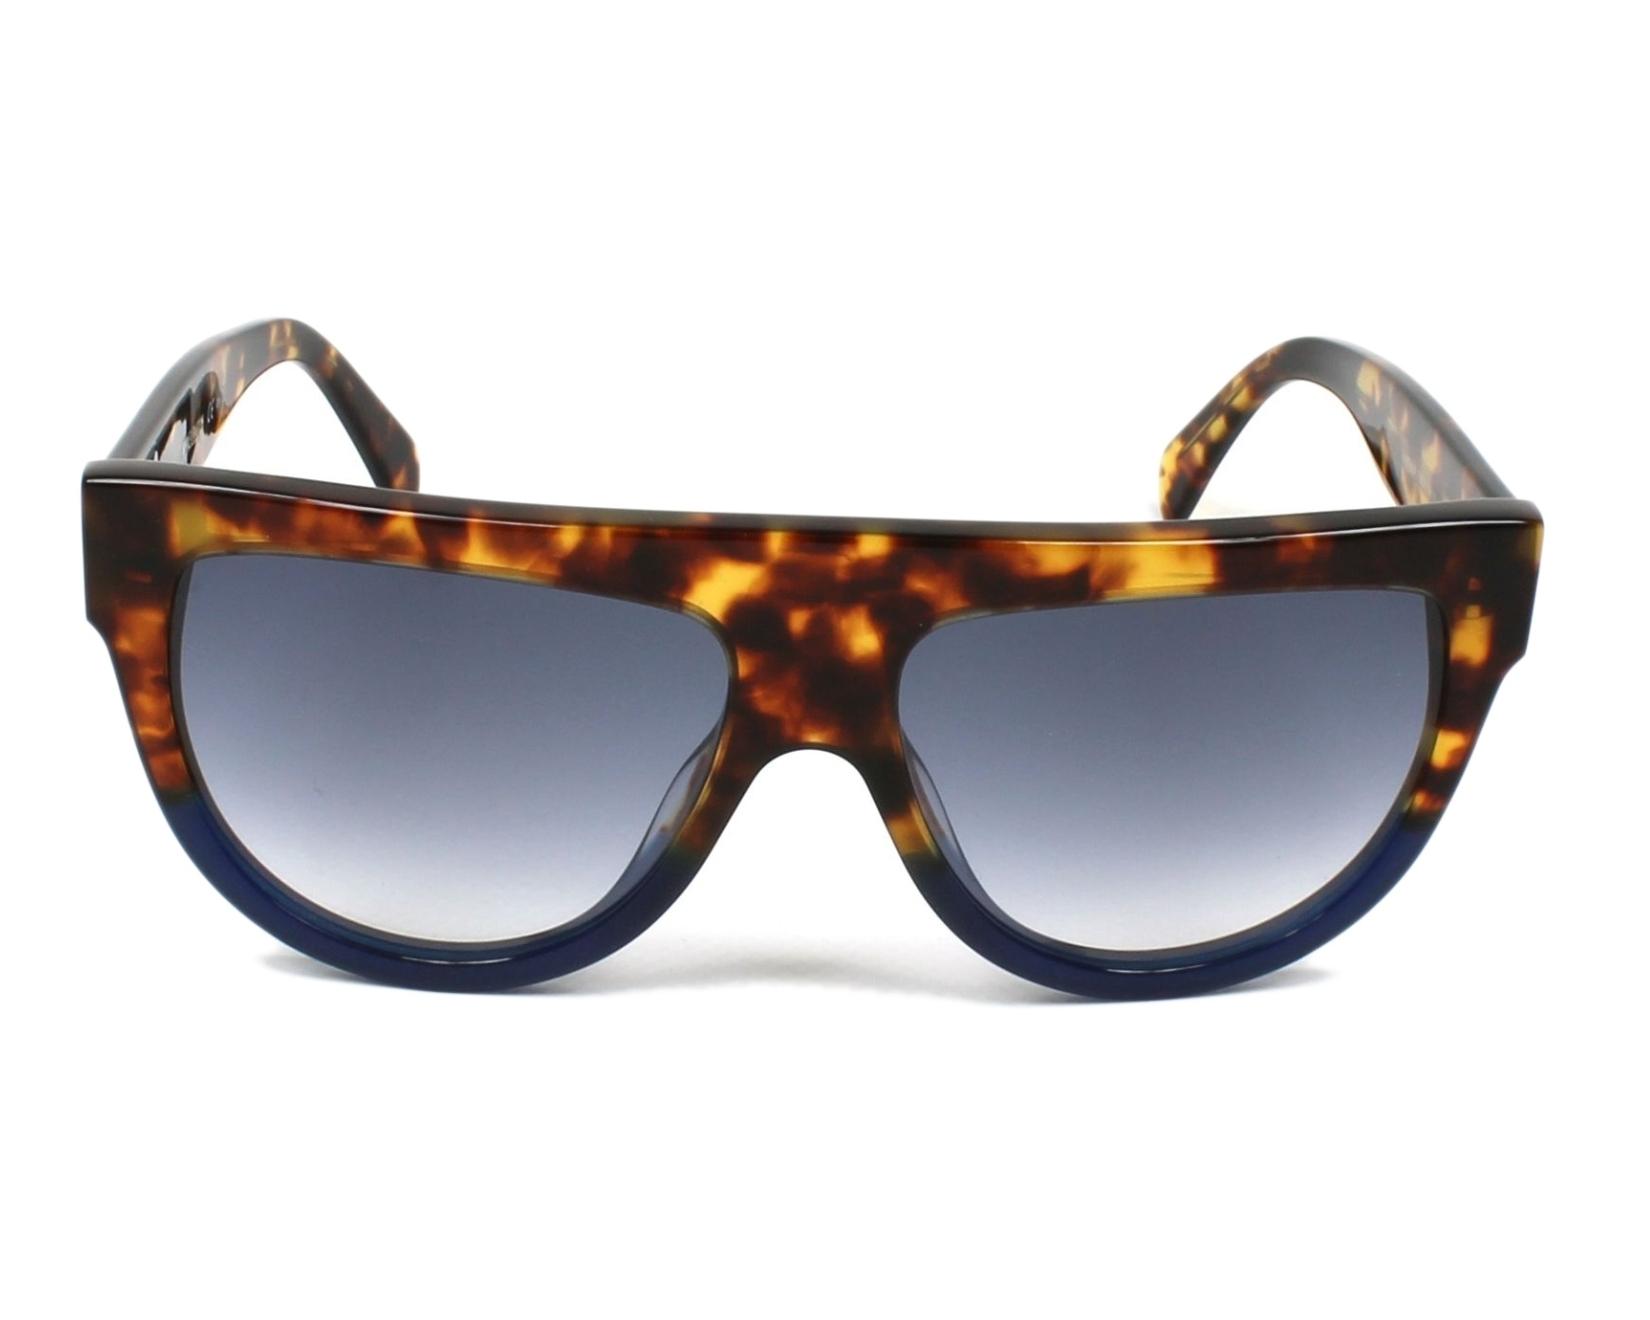 330bc7ea0e8e3 Sunglasses Céline CL-41026 FU9 DV - Havana Blue front view